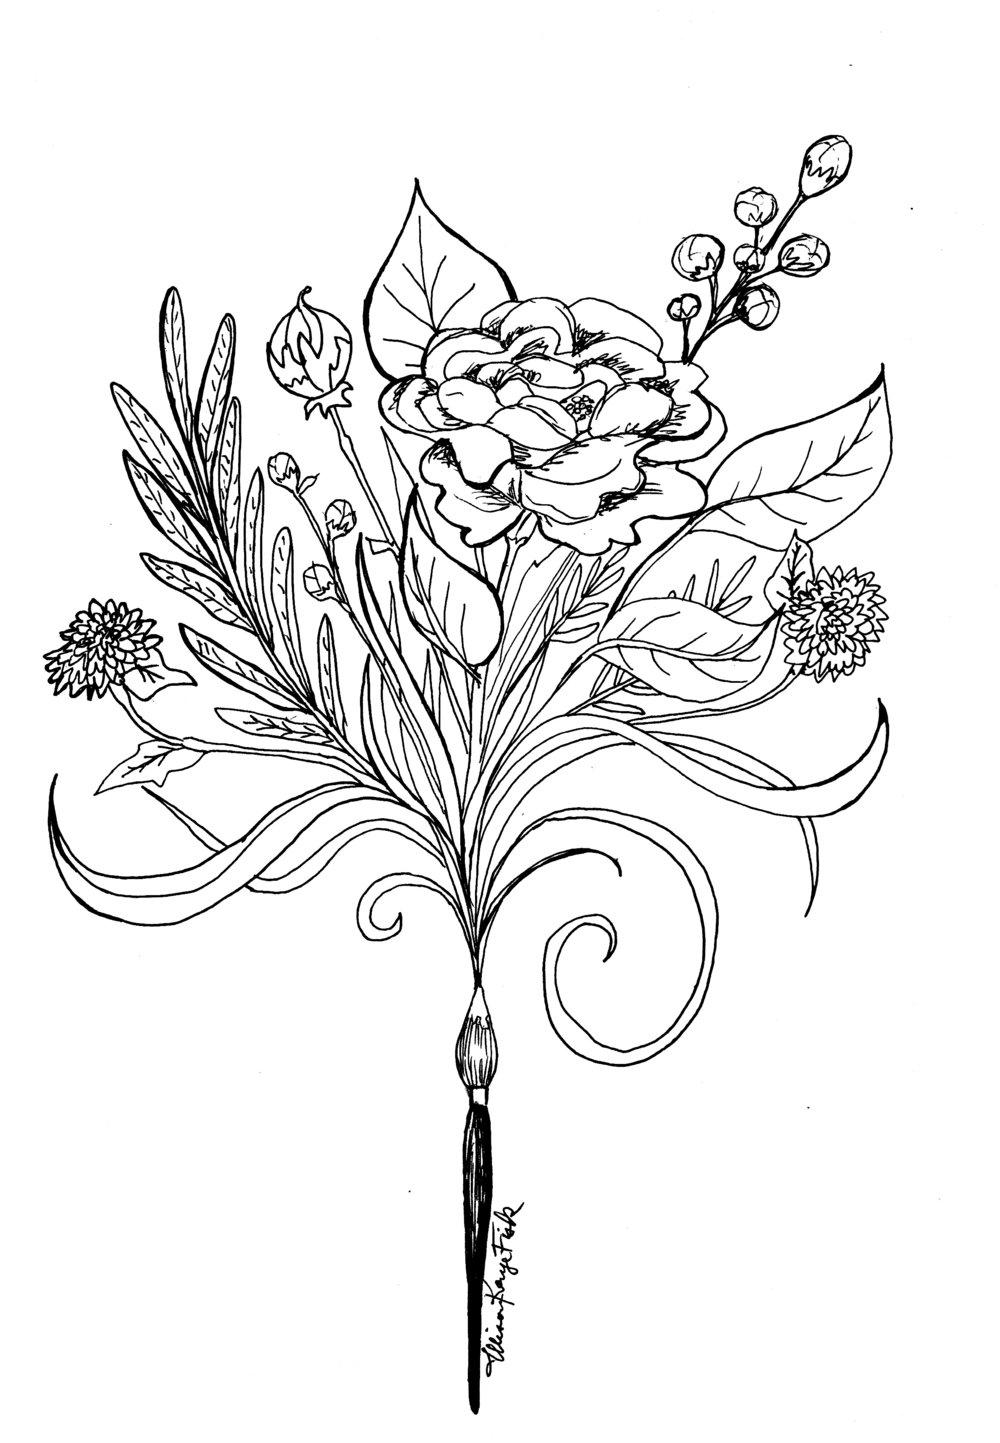 flowerbrush.jpeg